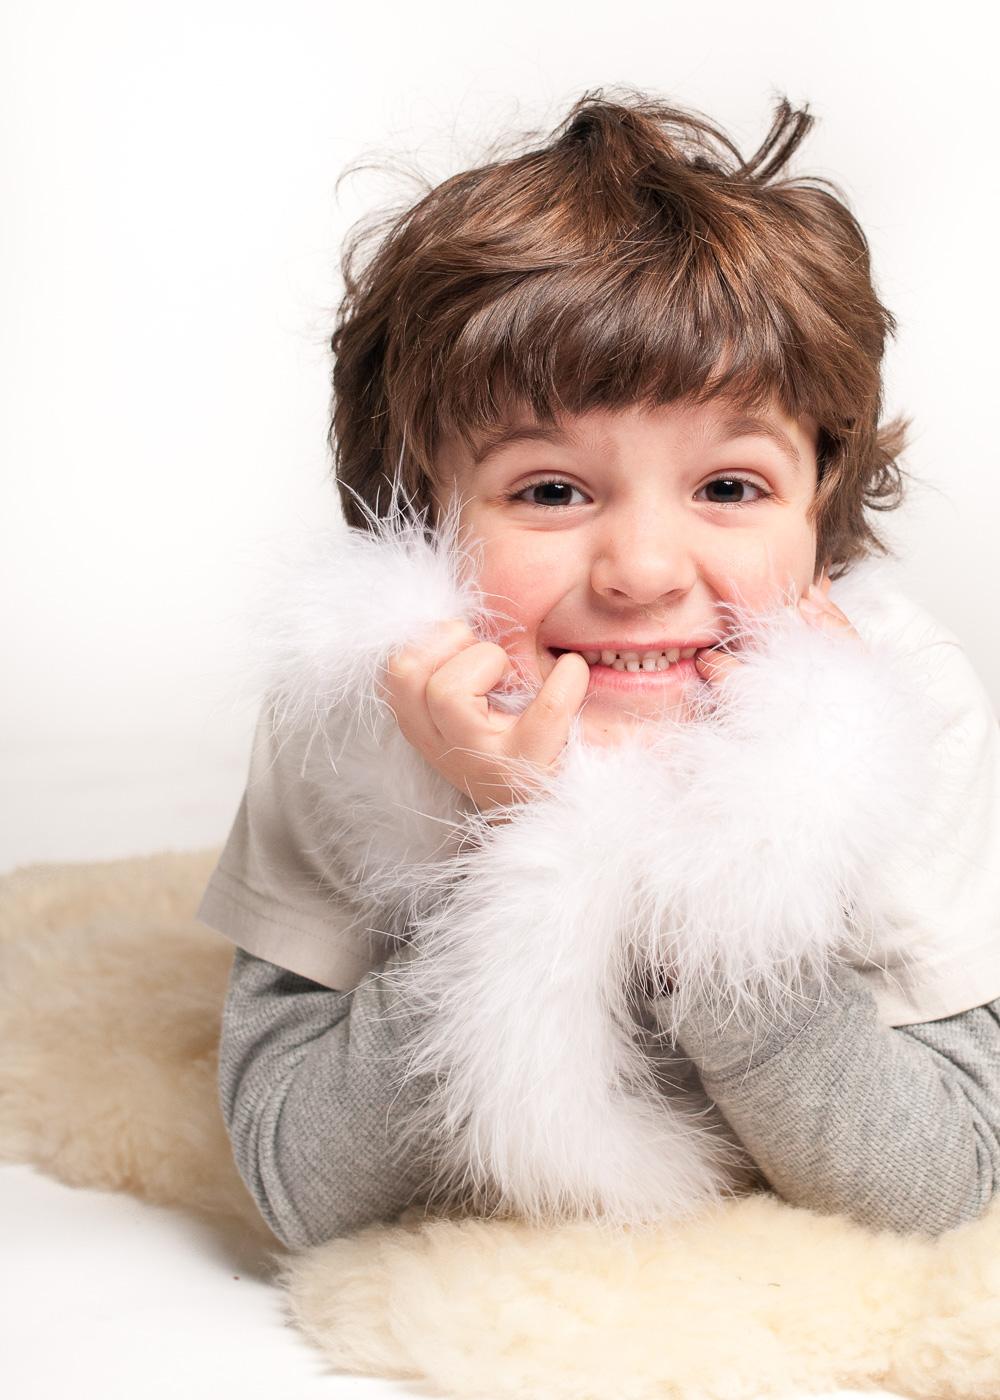 Child portrait photography - Studio